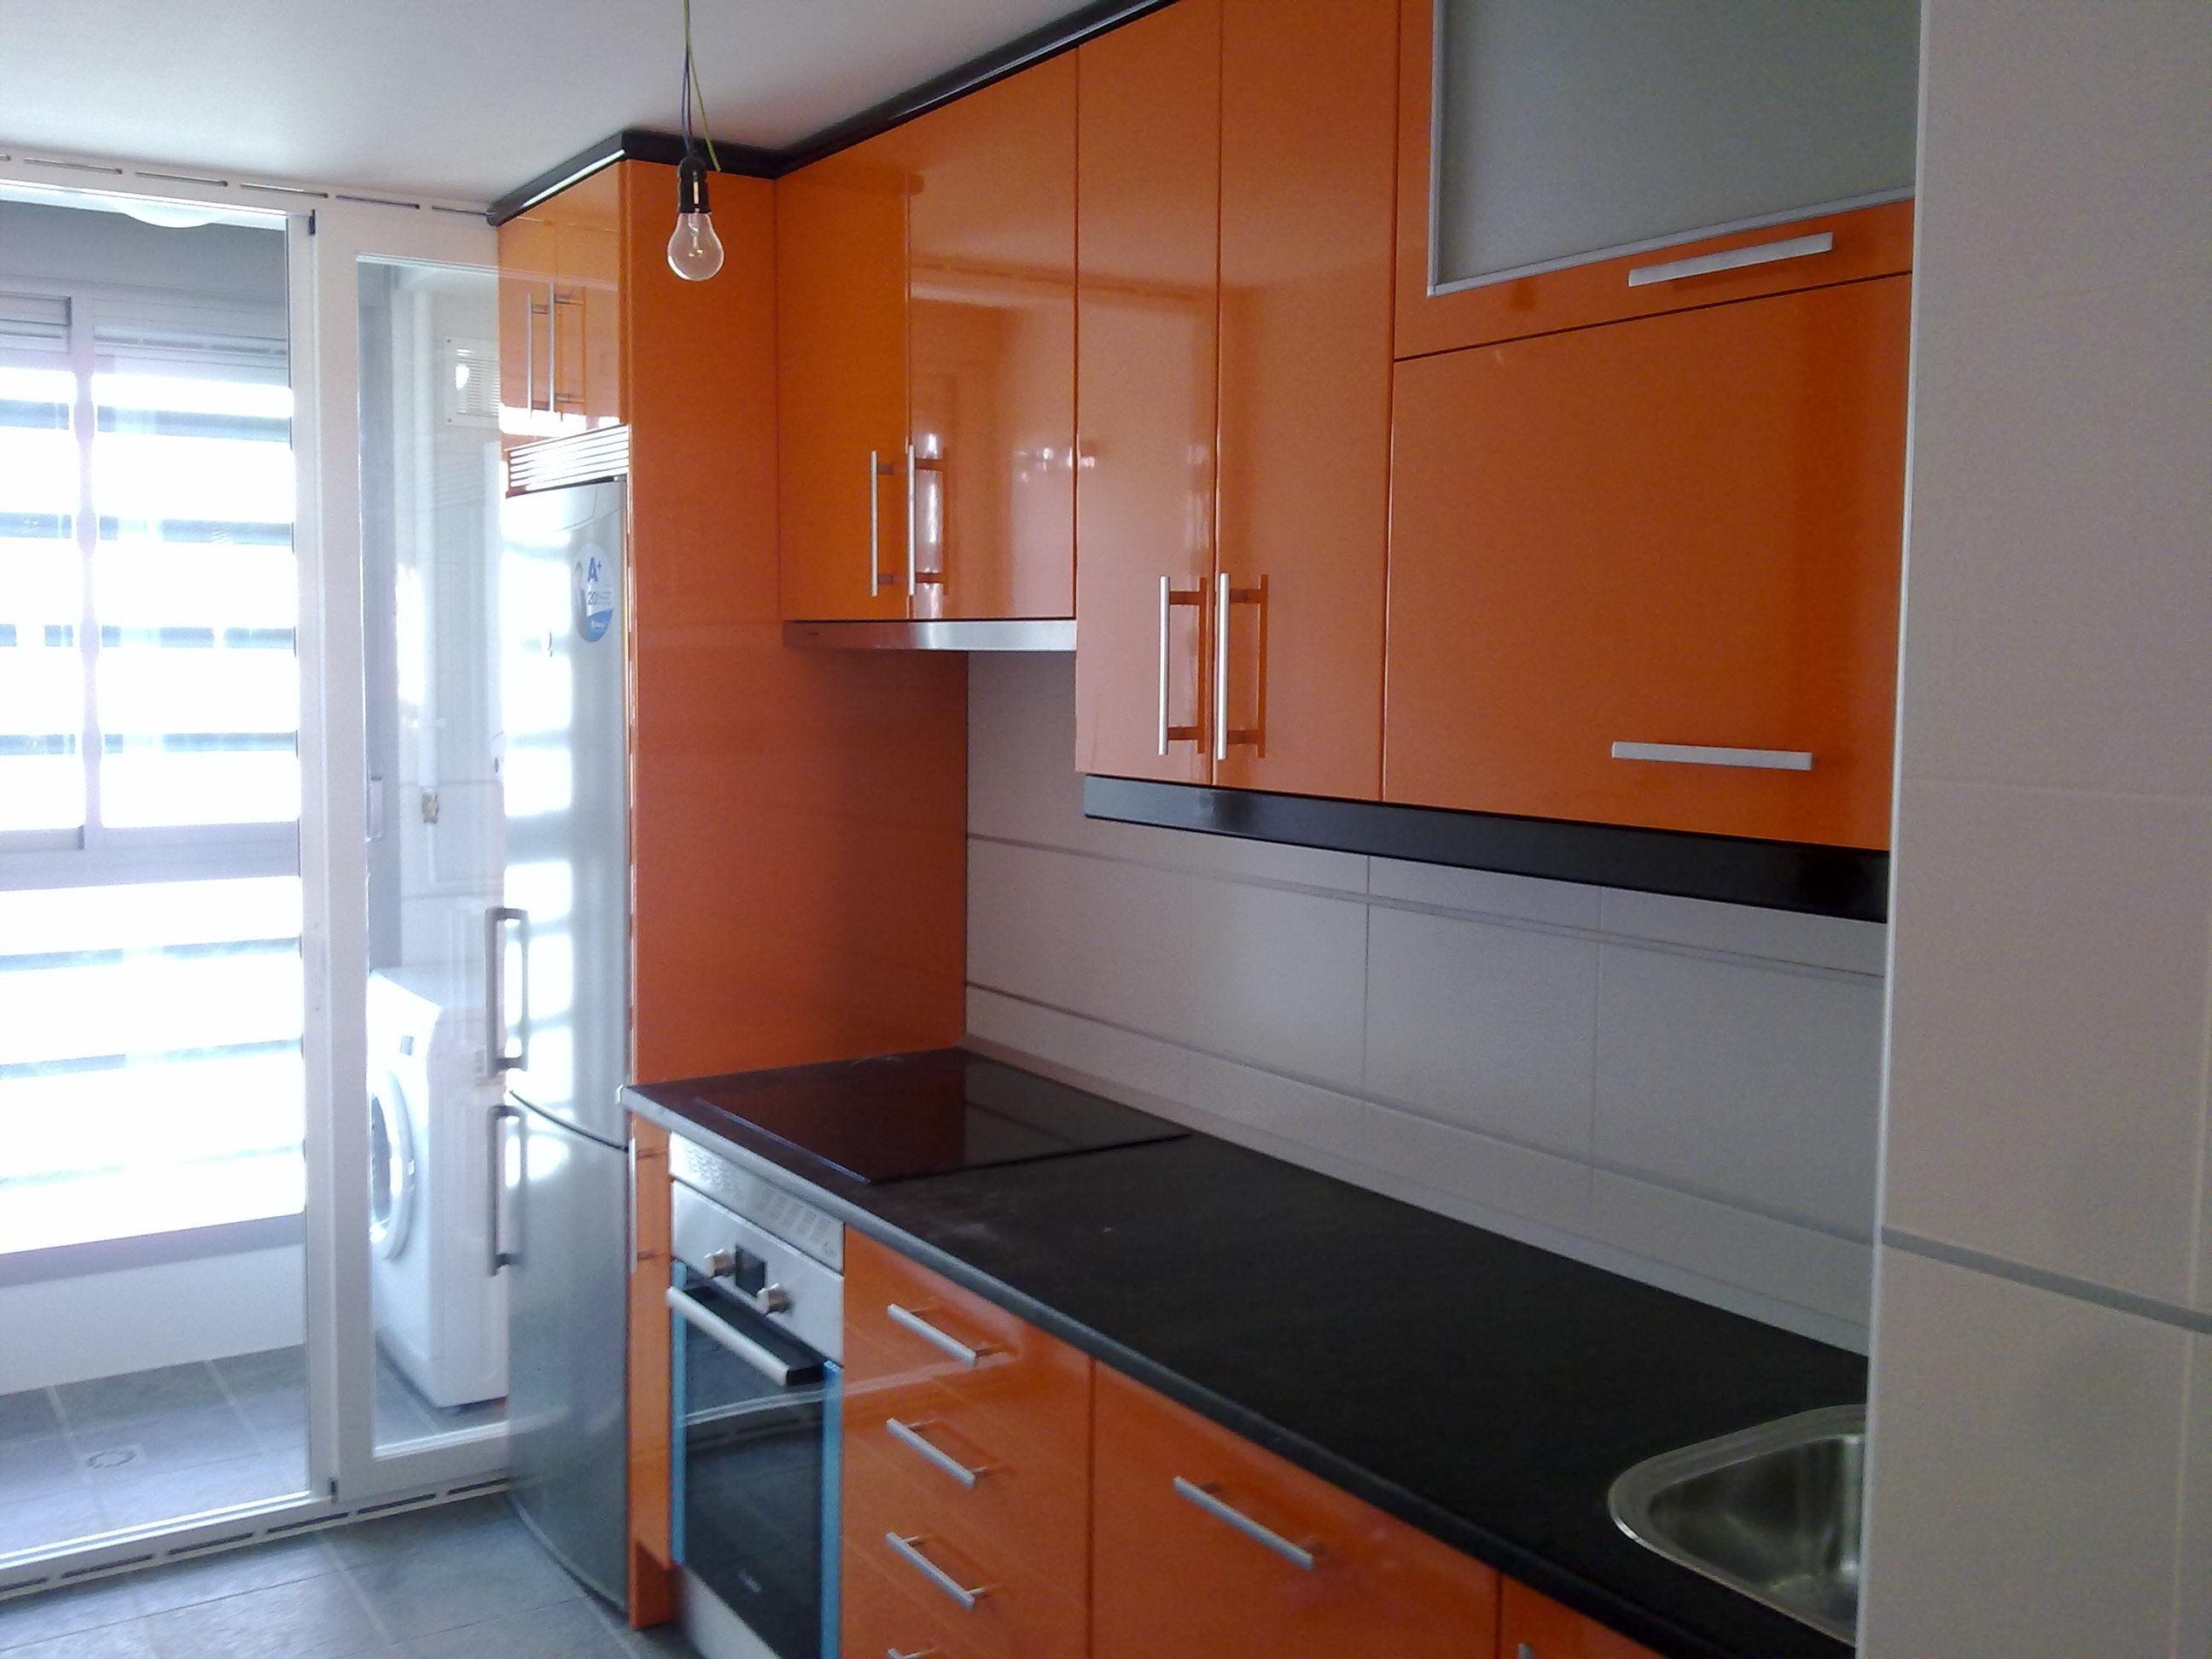 laminado alto brillo naranja glo 122 br, remates negro encimera glp 283 slate